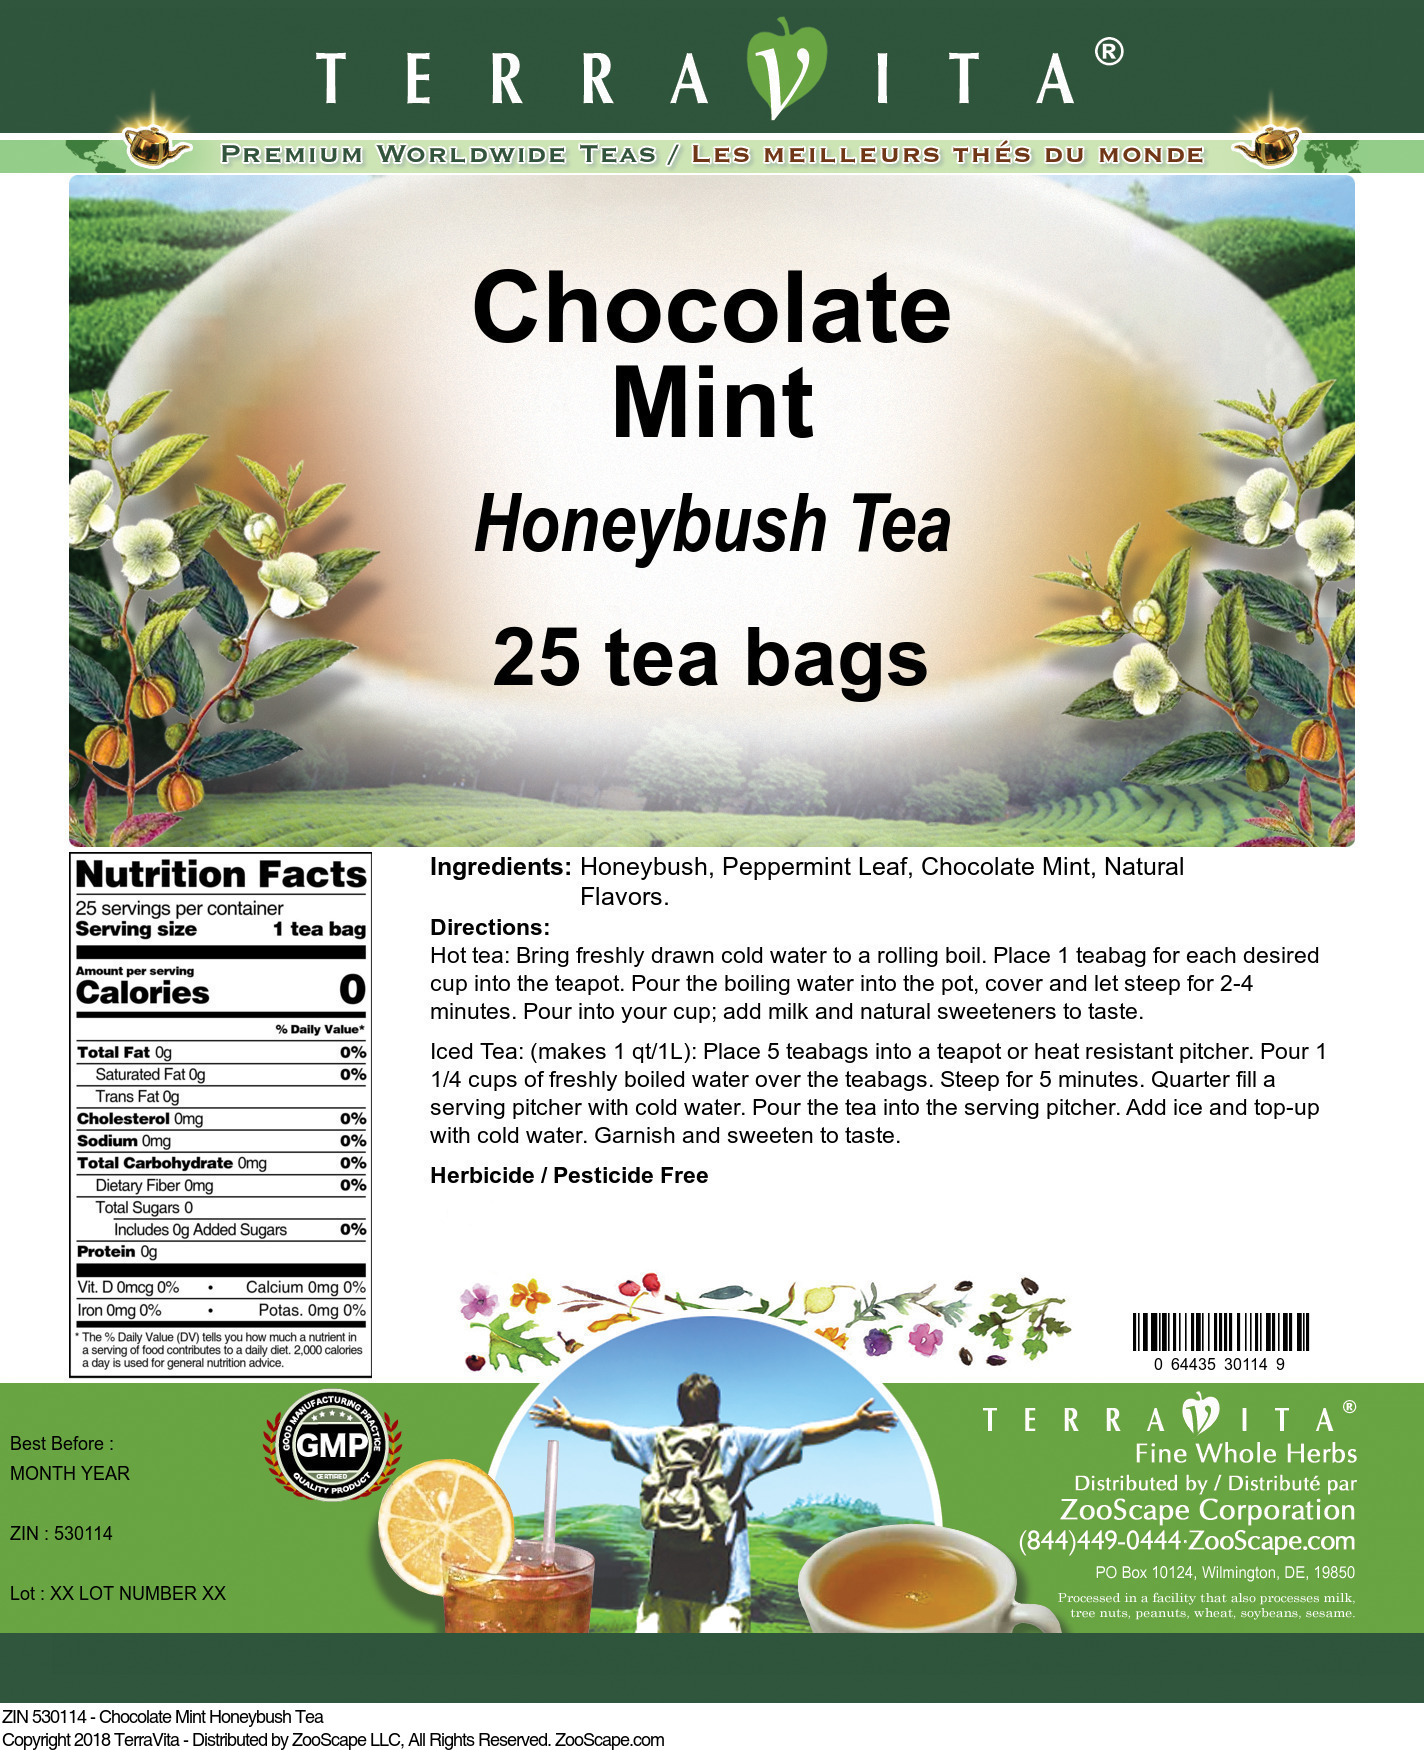 Chocolate Mint Honeybush Tea